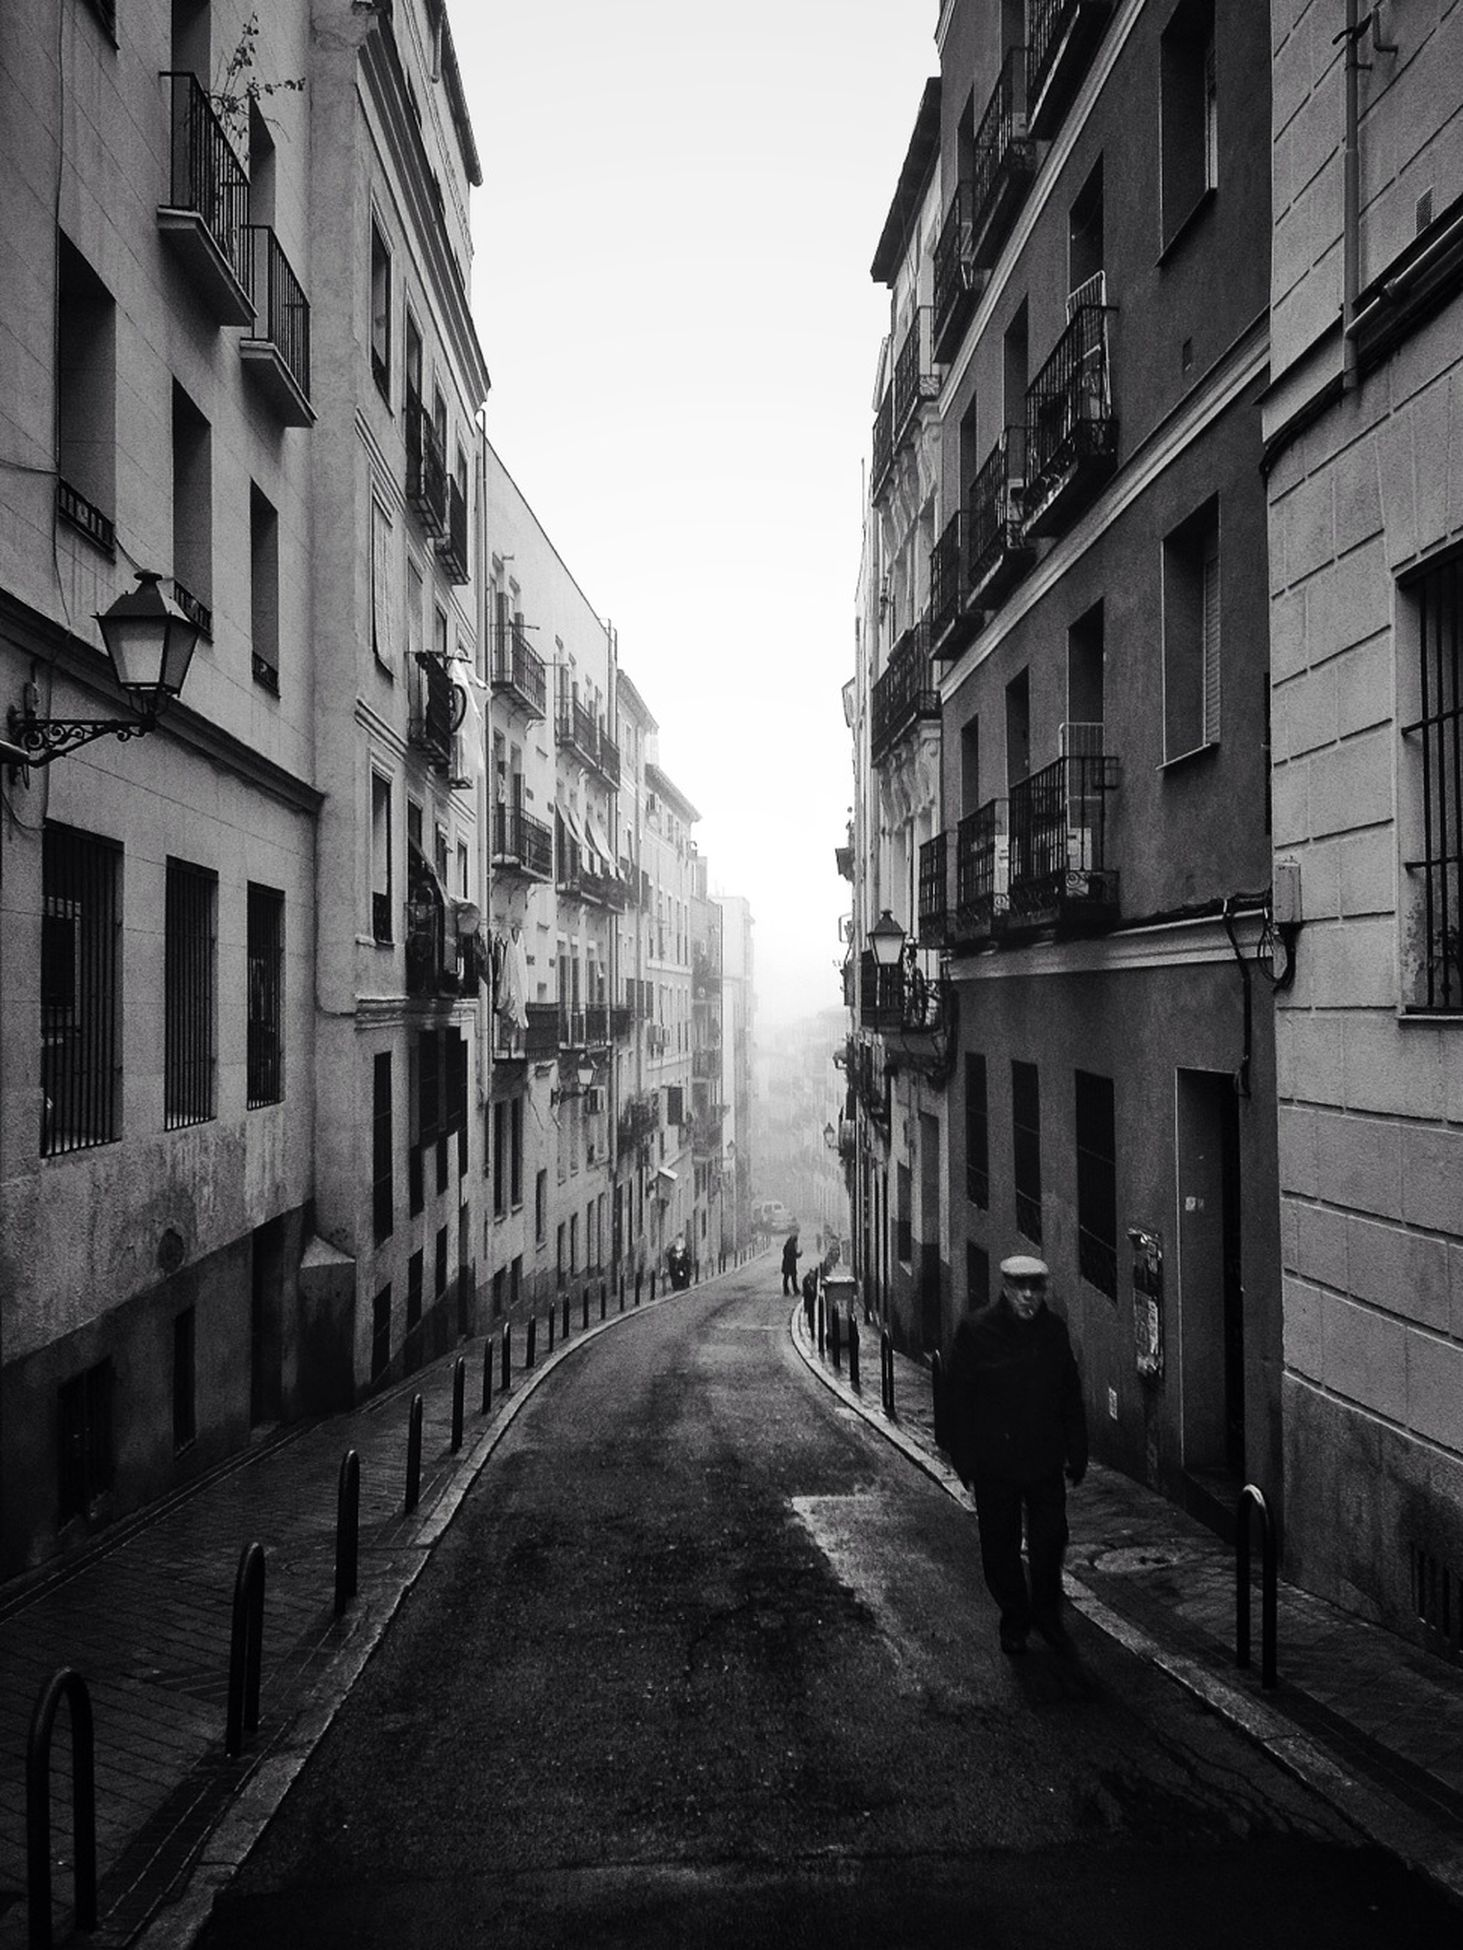 perspective, narrow, the way forward, city life, leading, exterior